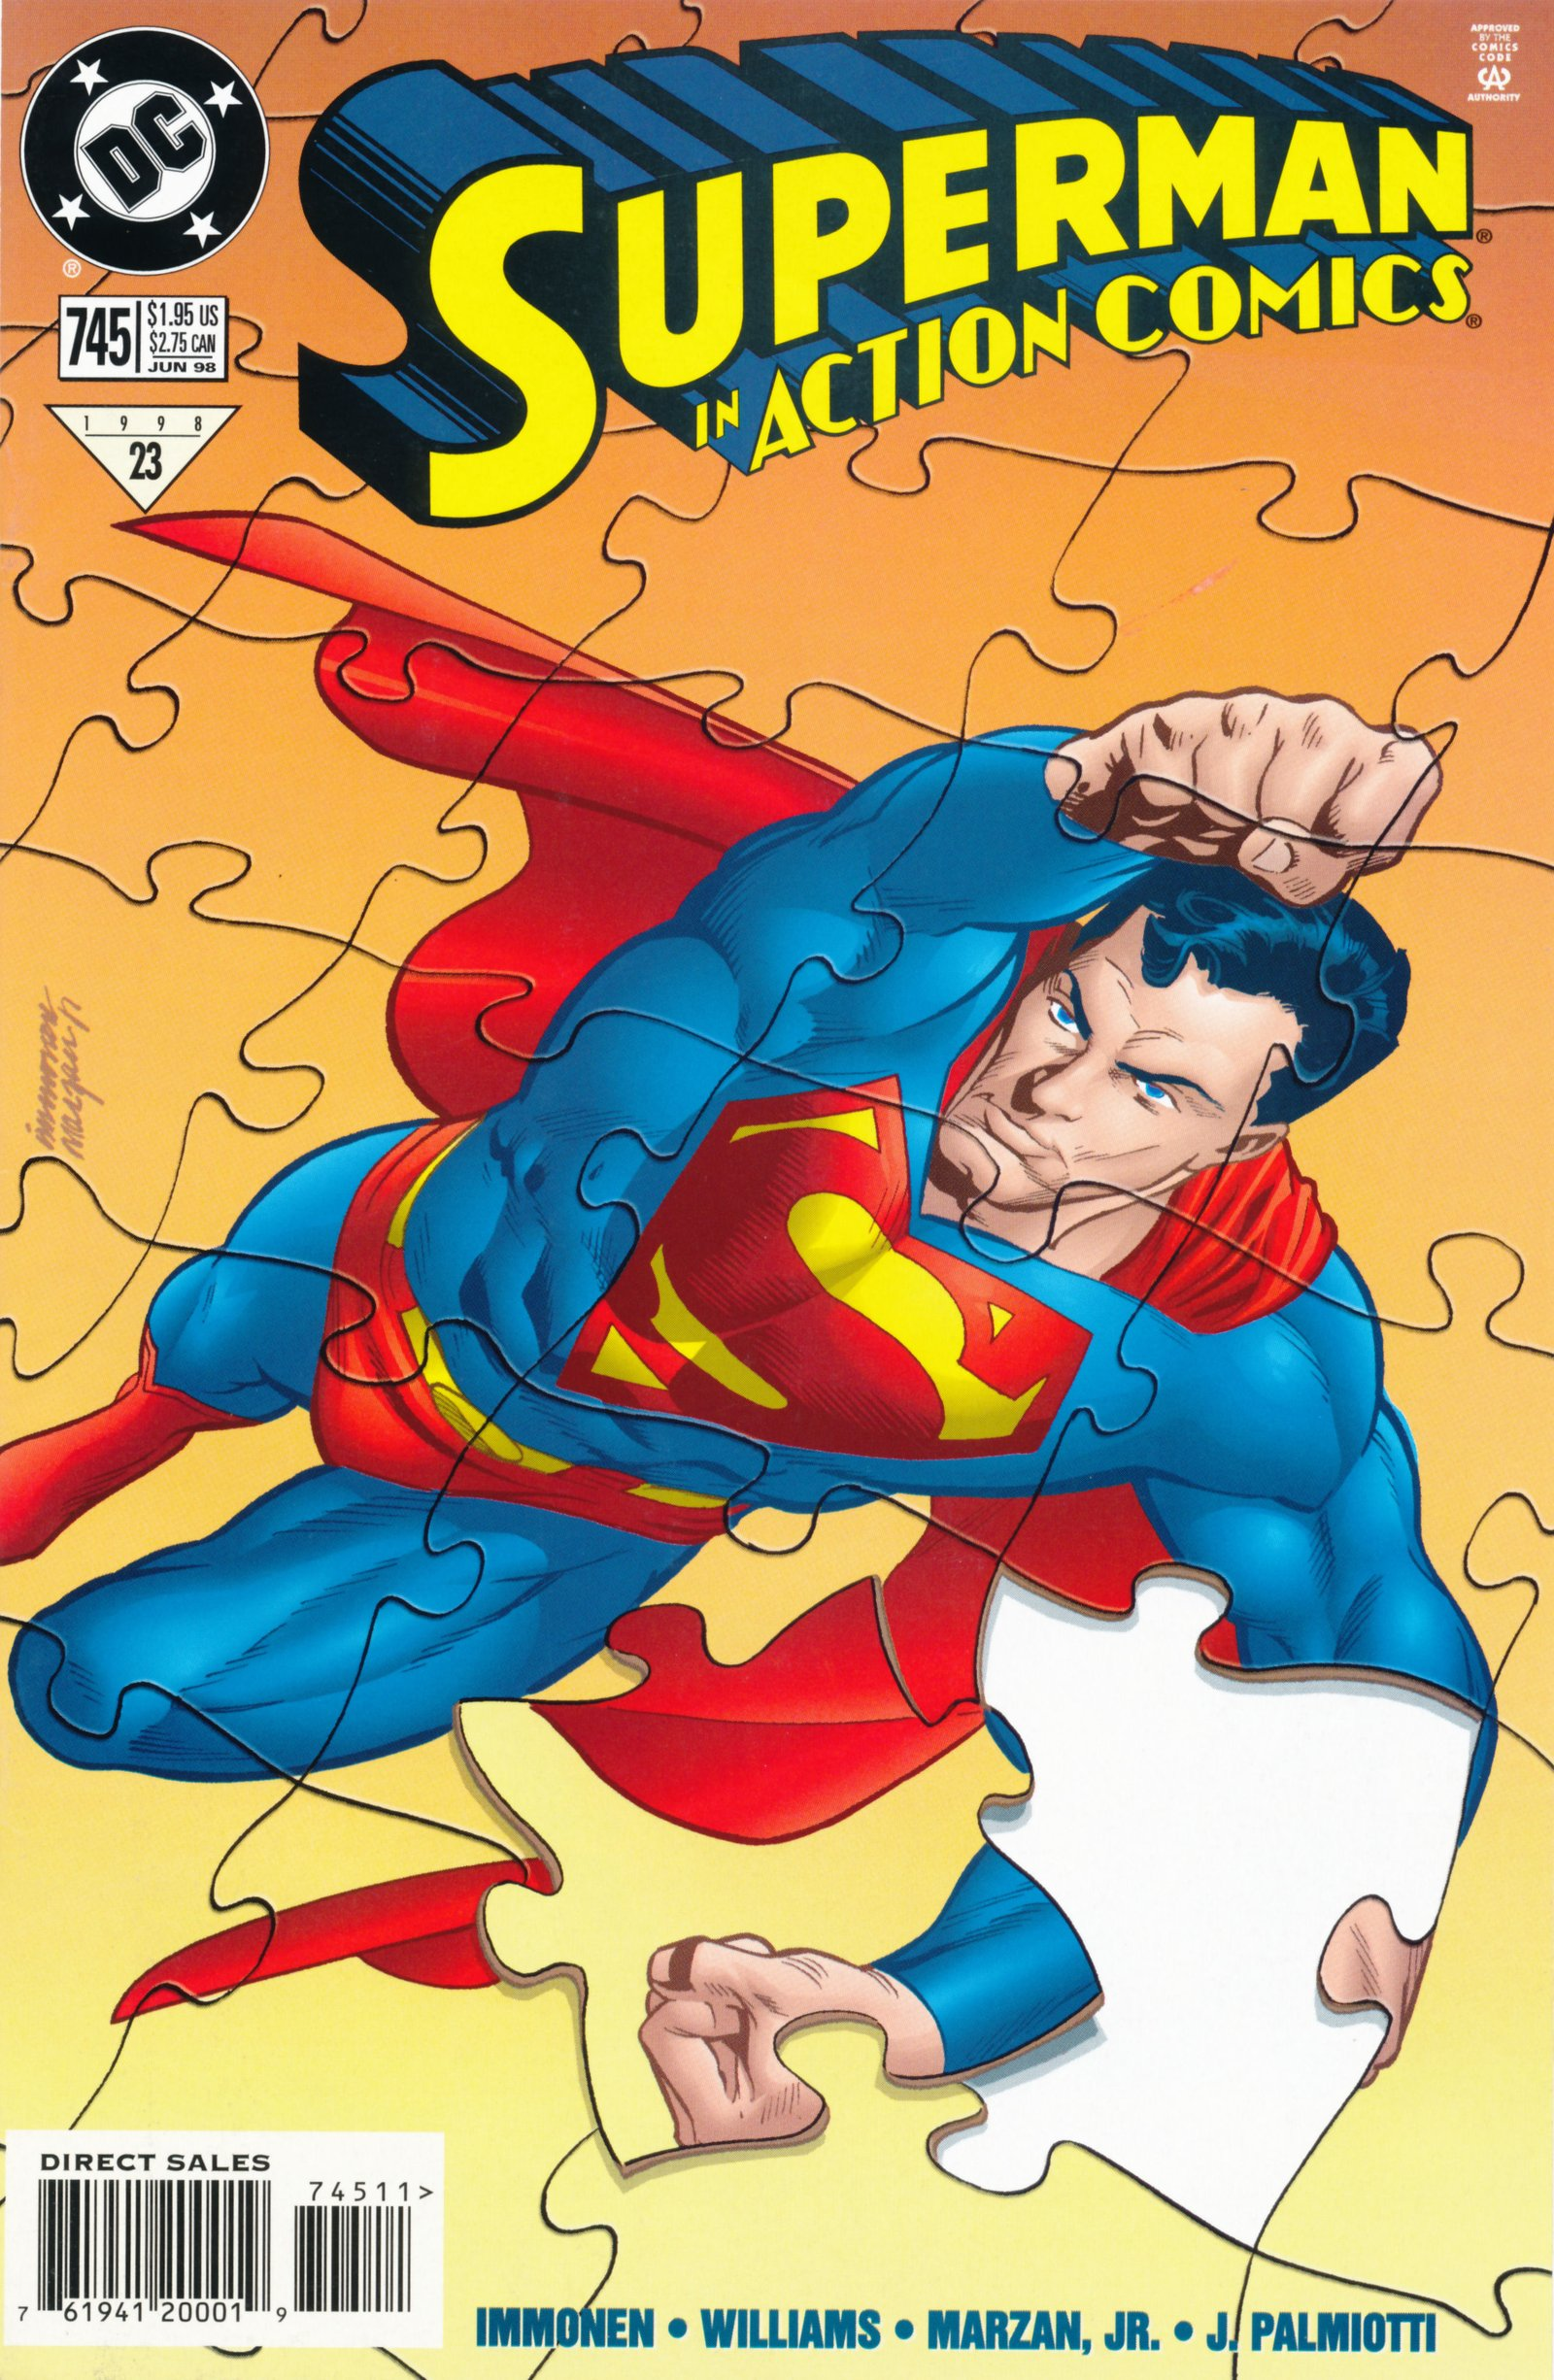 Action Comics (1938) 745 Page 1